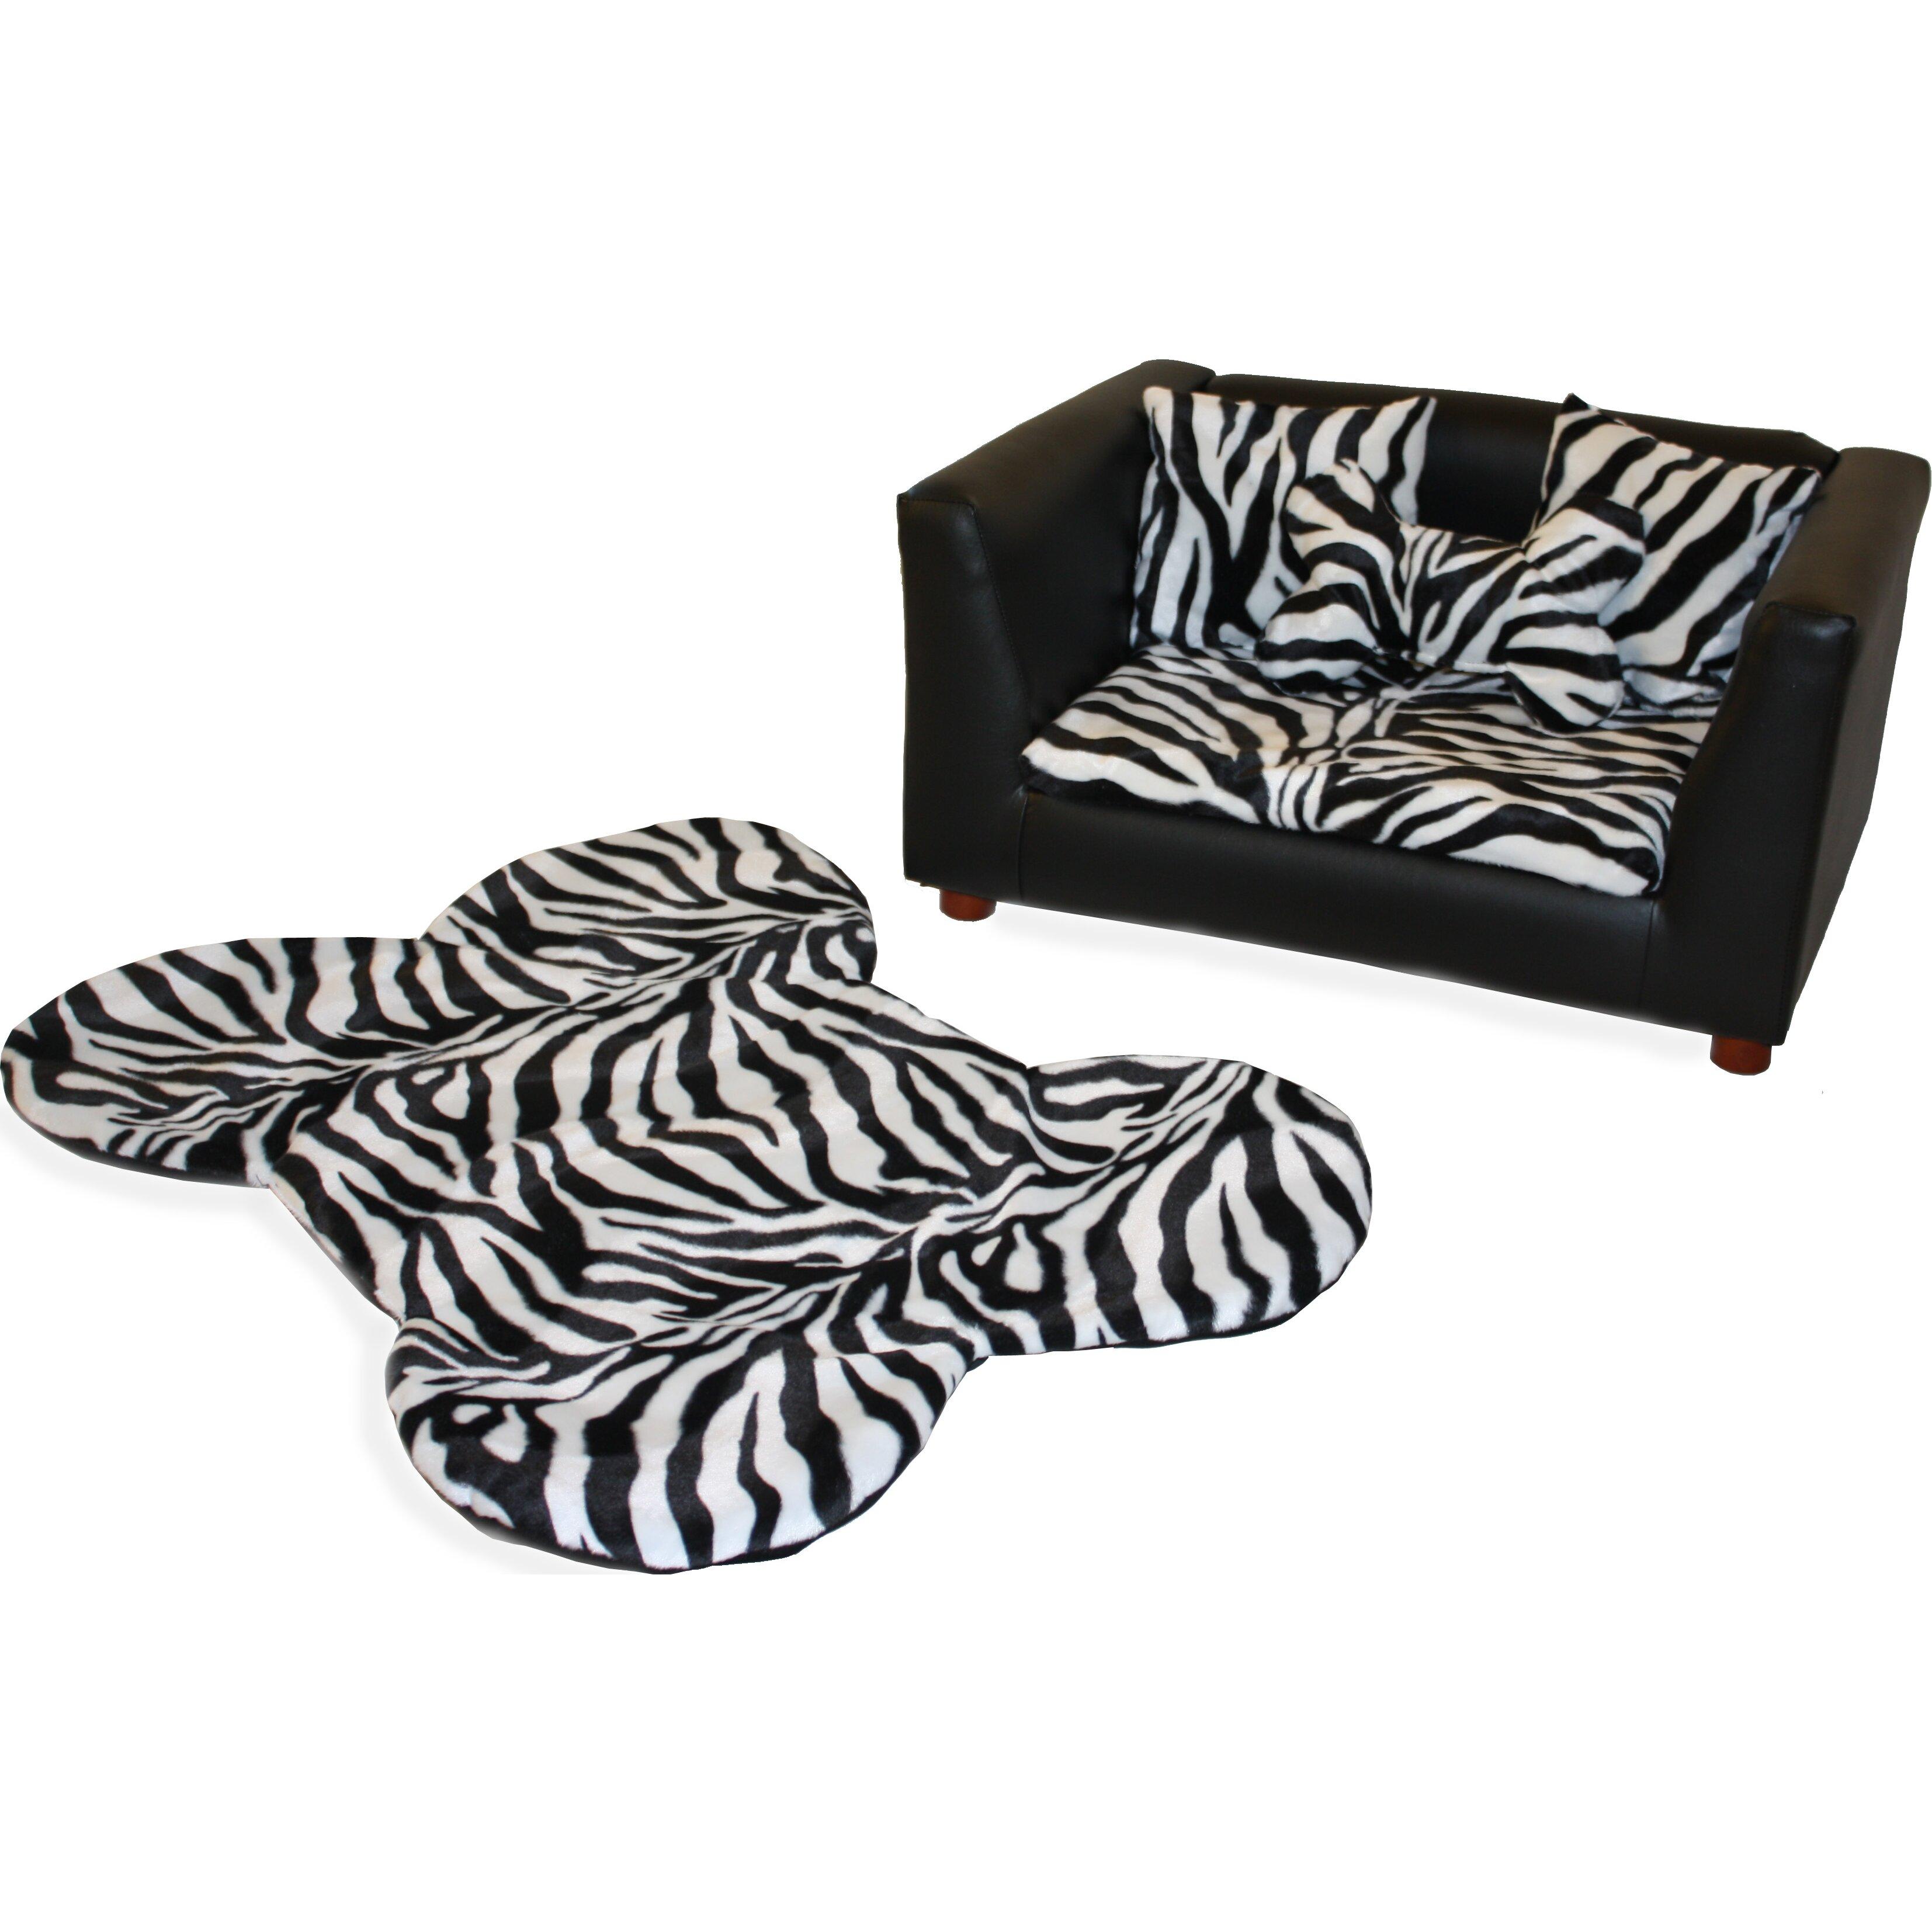 keet deluxe orthopedic zebra memory foam dog chair set. Black Bedroom Furniture Sets. Home Design Ideas